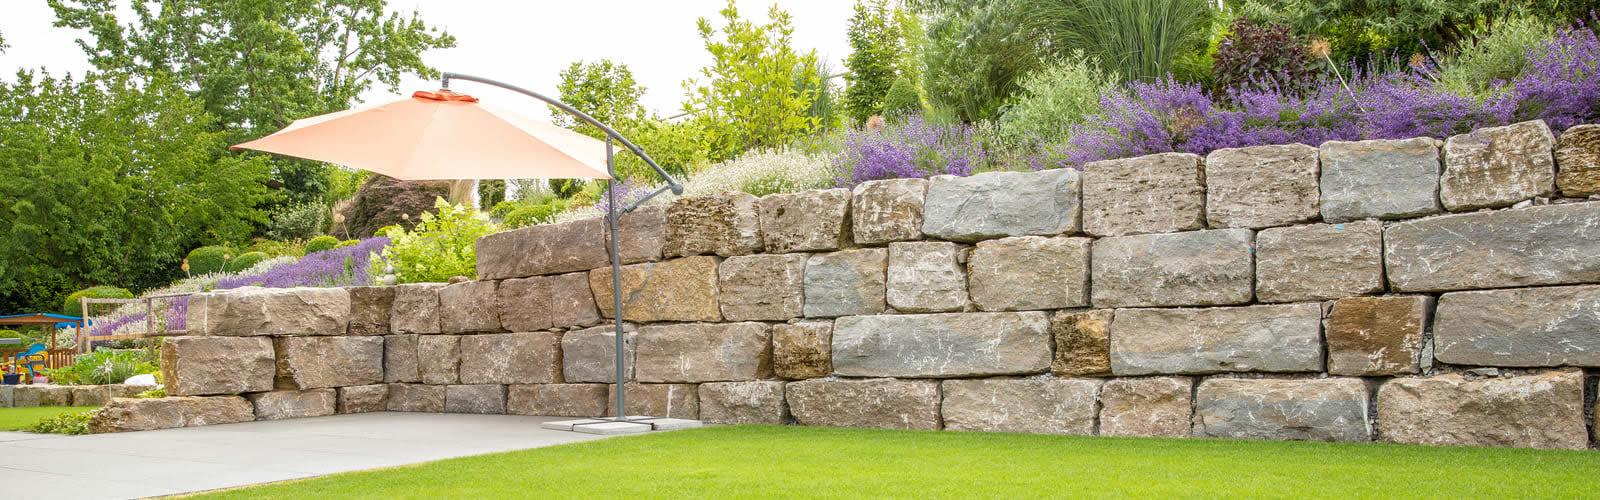 Mauerbau